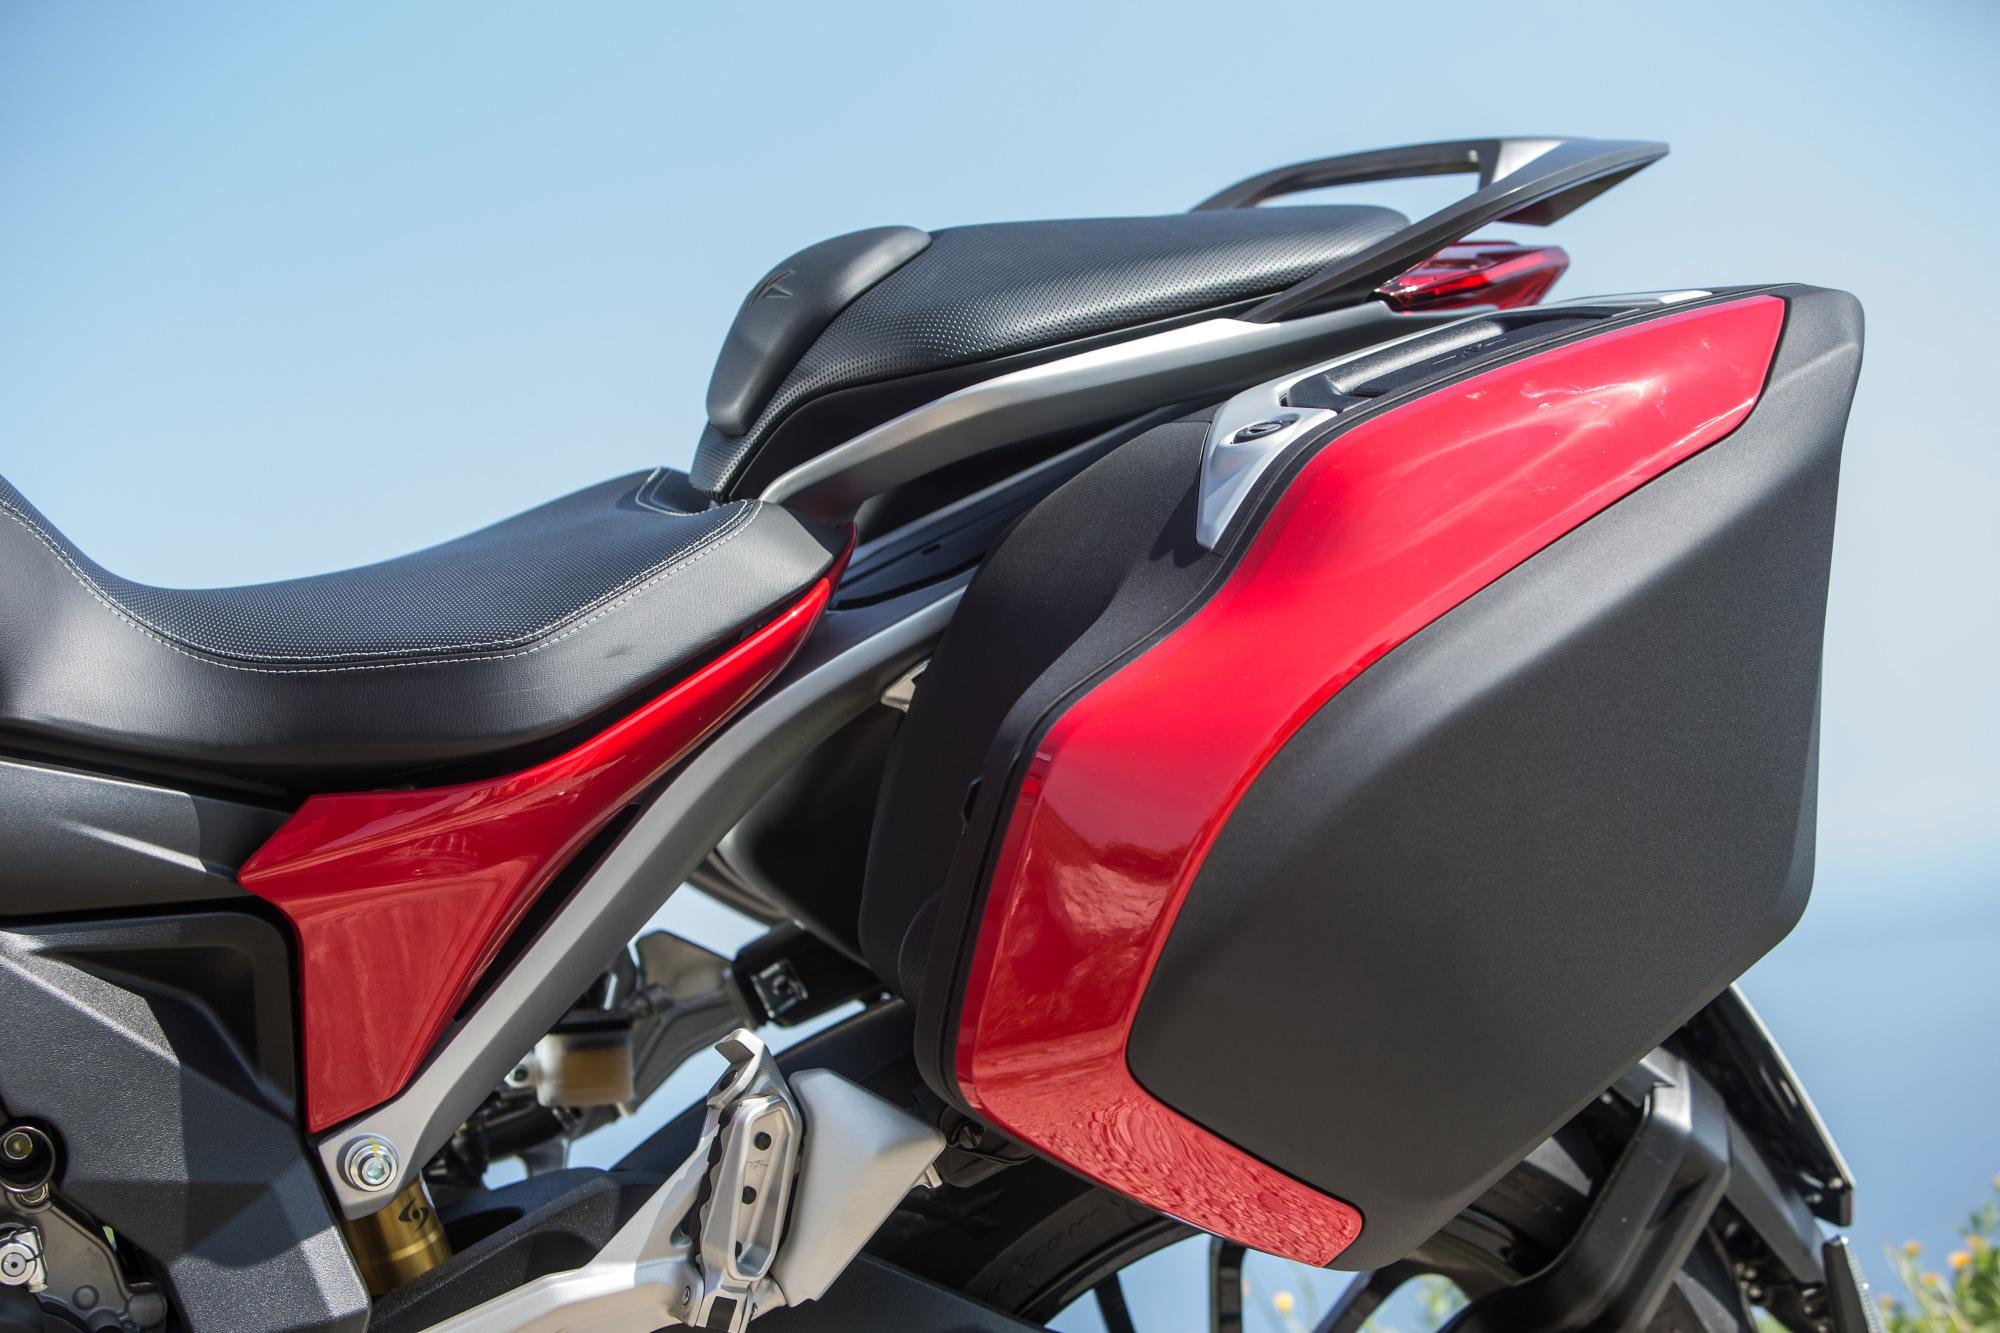 2015 mv agusta turismo veloce first ride superbike magazine. Black Bedroom Furniture Sets. Home Design Ideas